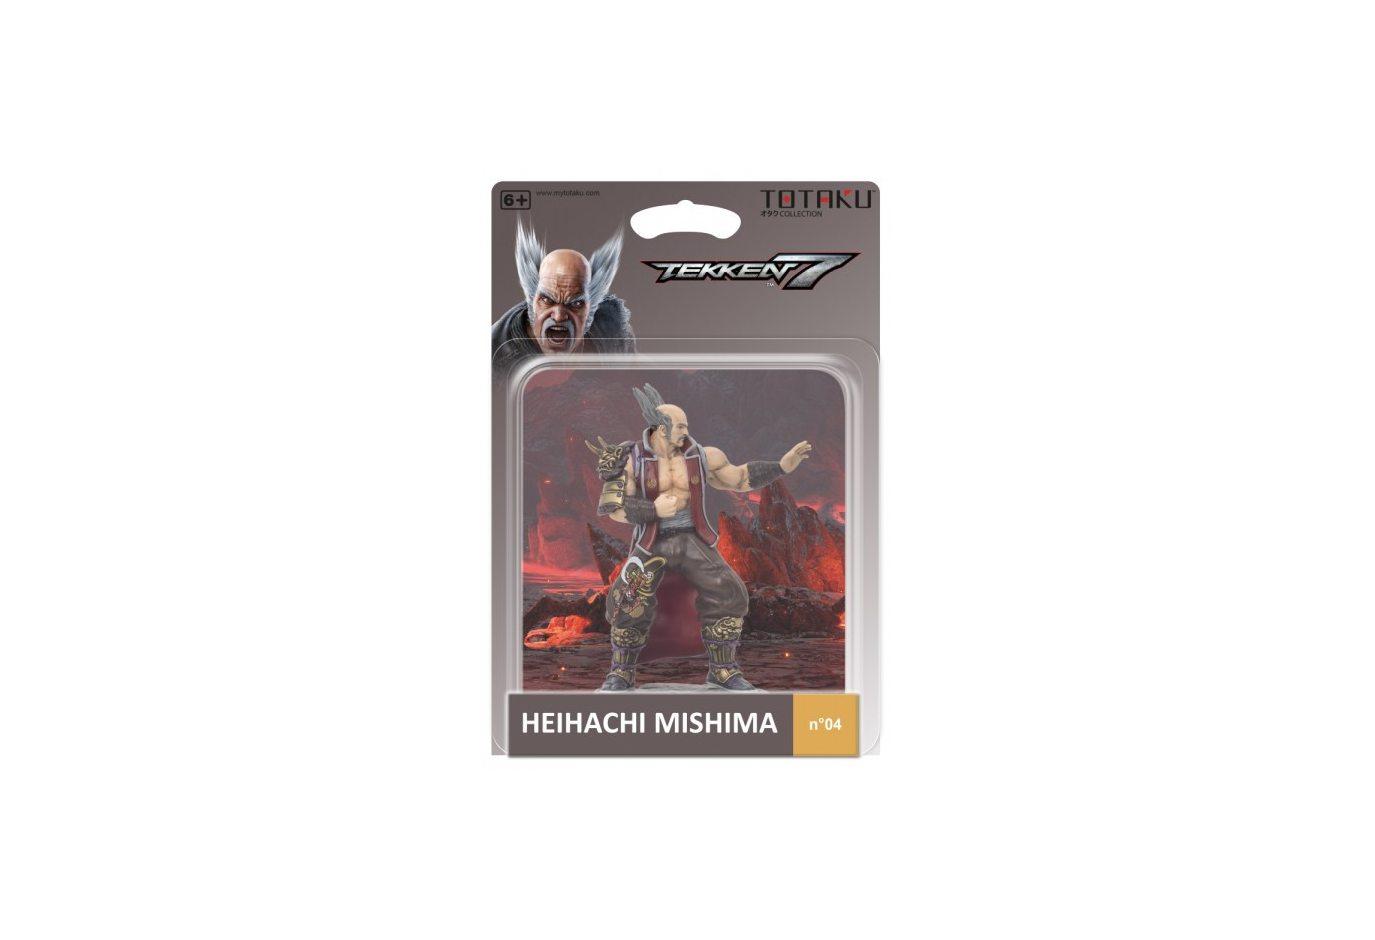 Фигурка TOTAKU Collection: Tekken 7 Heihachi Mishima 10 см